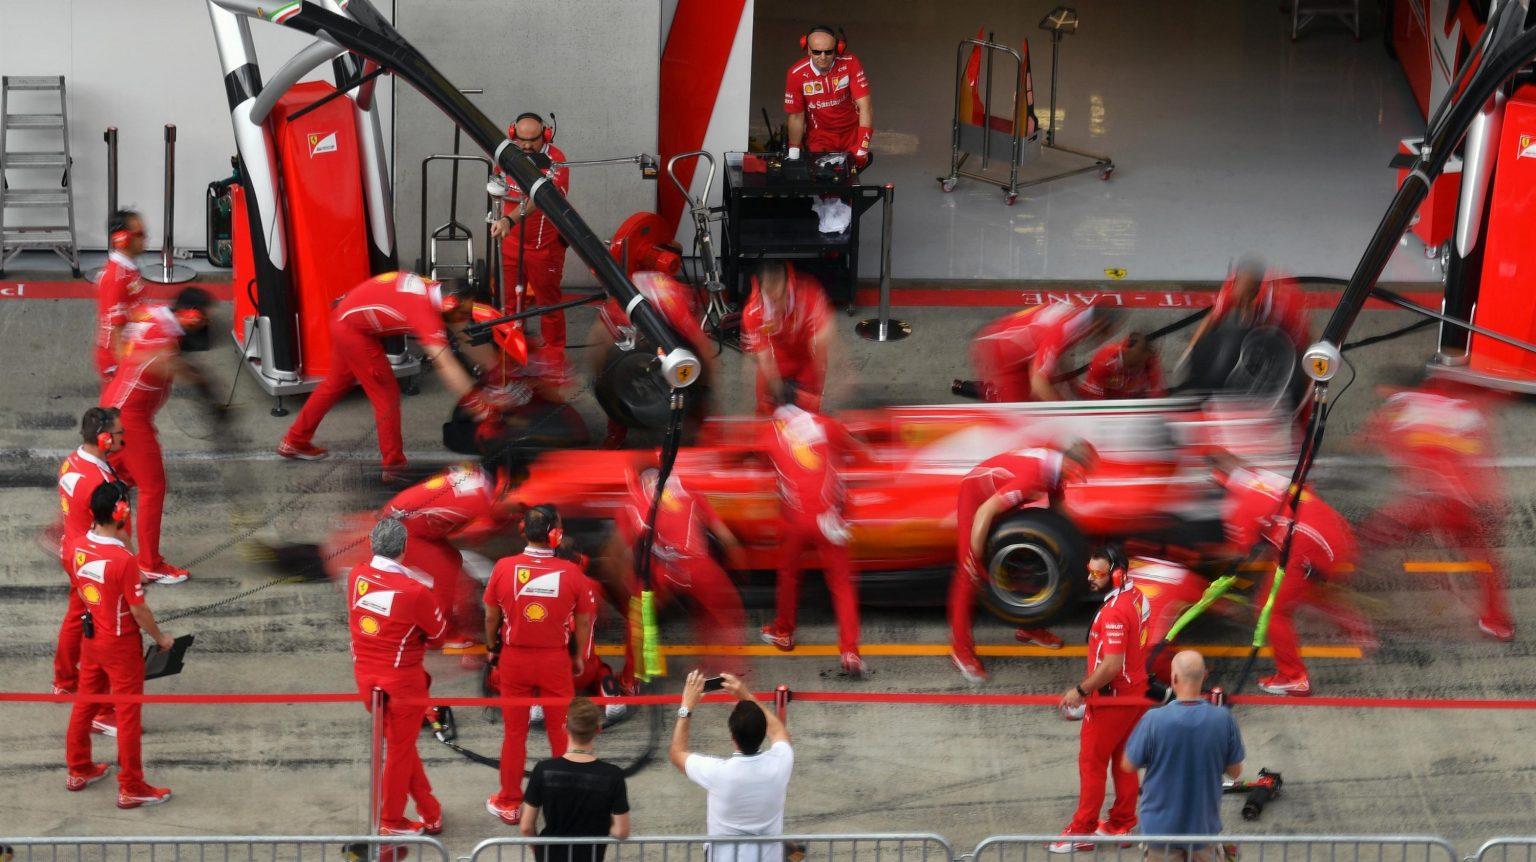 Formula One Austrian Grand Prix - Ferrari pitstop.jpg